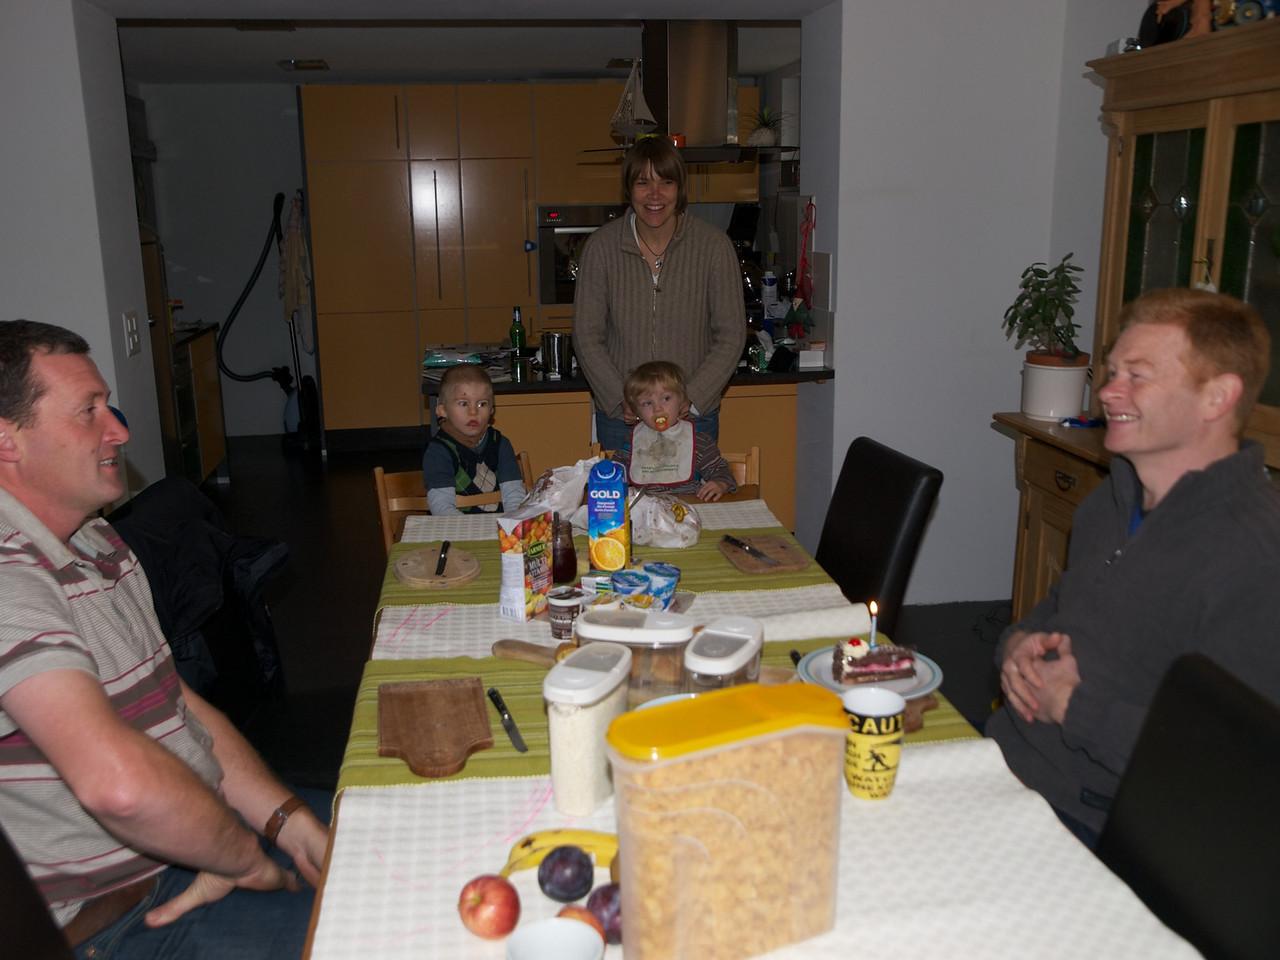 Friday 29th Oct 2010 - John enjoys his 50th Birthday cake